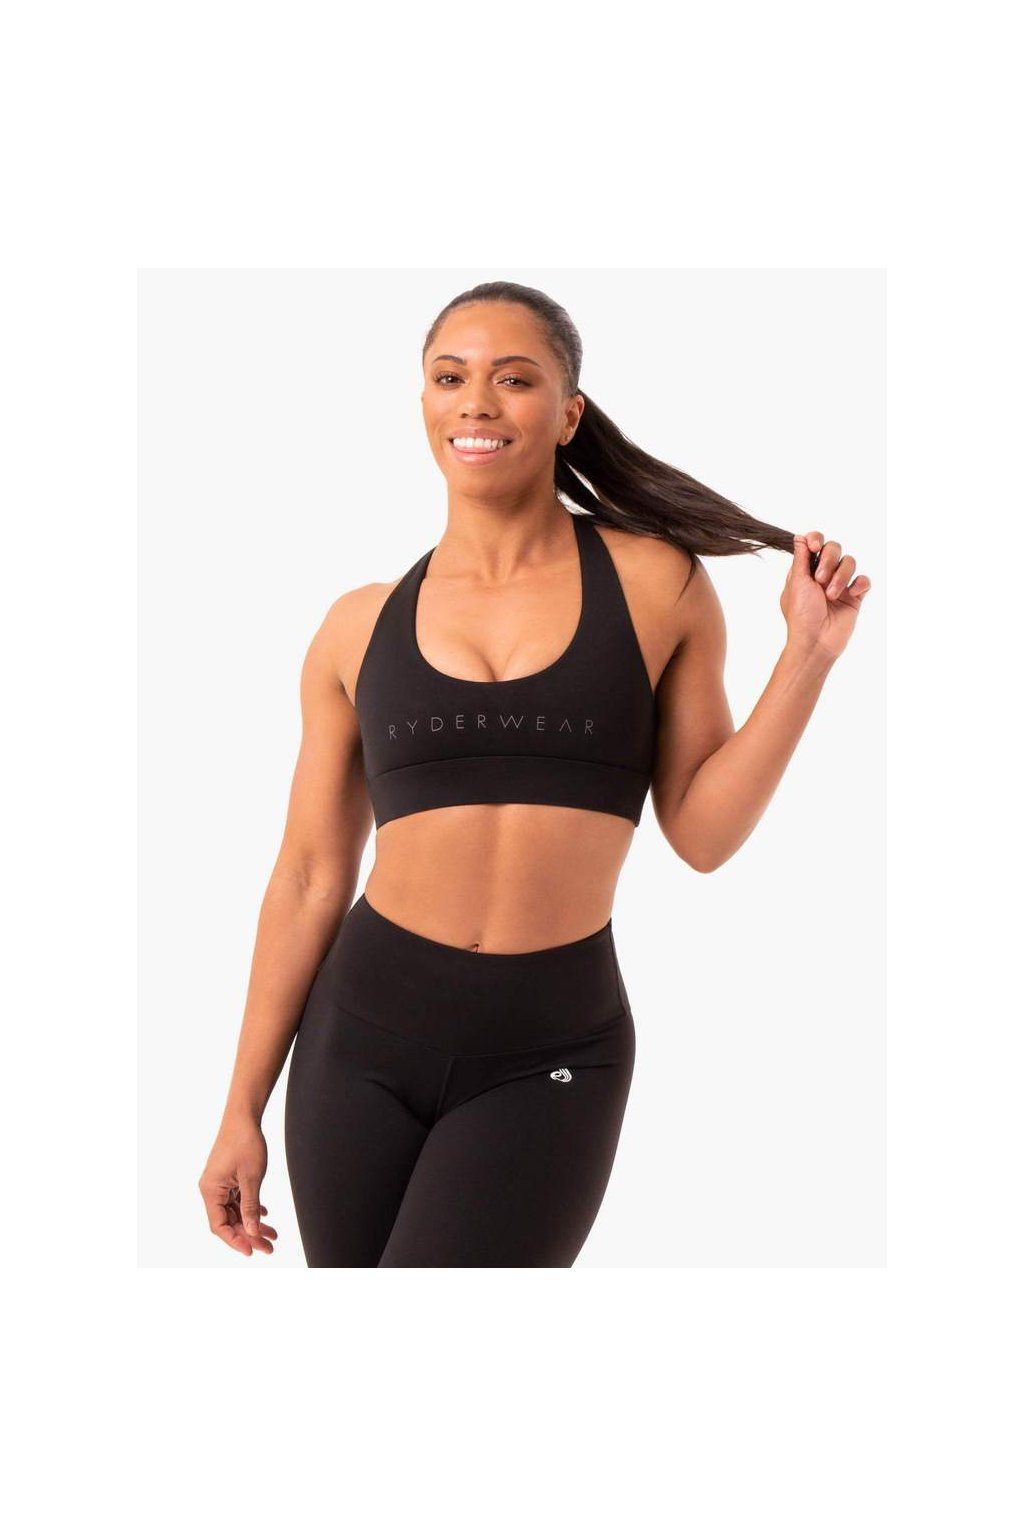 staples cross over sports bra black clothing ryderwear 537613 1000x1000